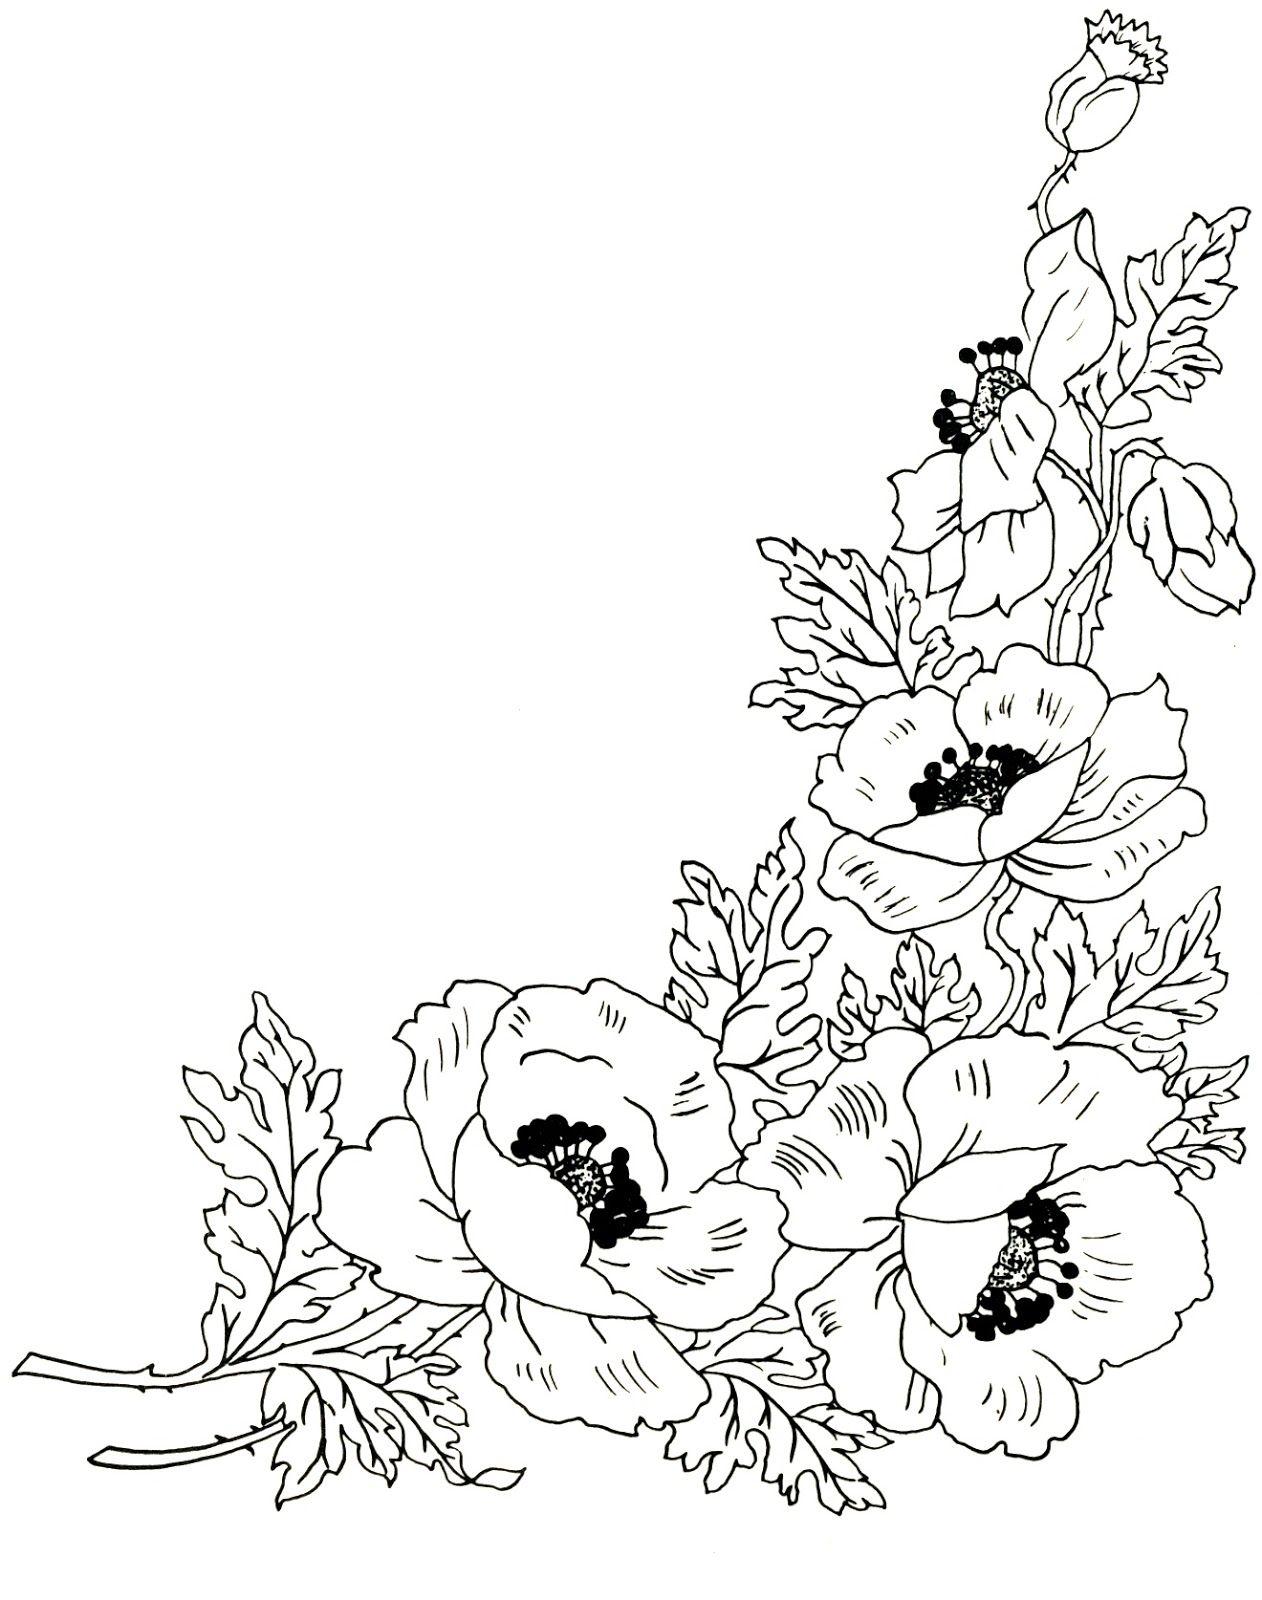 Digital two for tuesday beautiful flower designs for embroidery or digital two for tuesday beautiful flower designs for embroidery or digital stamping izmirmasajfo